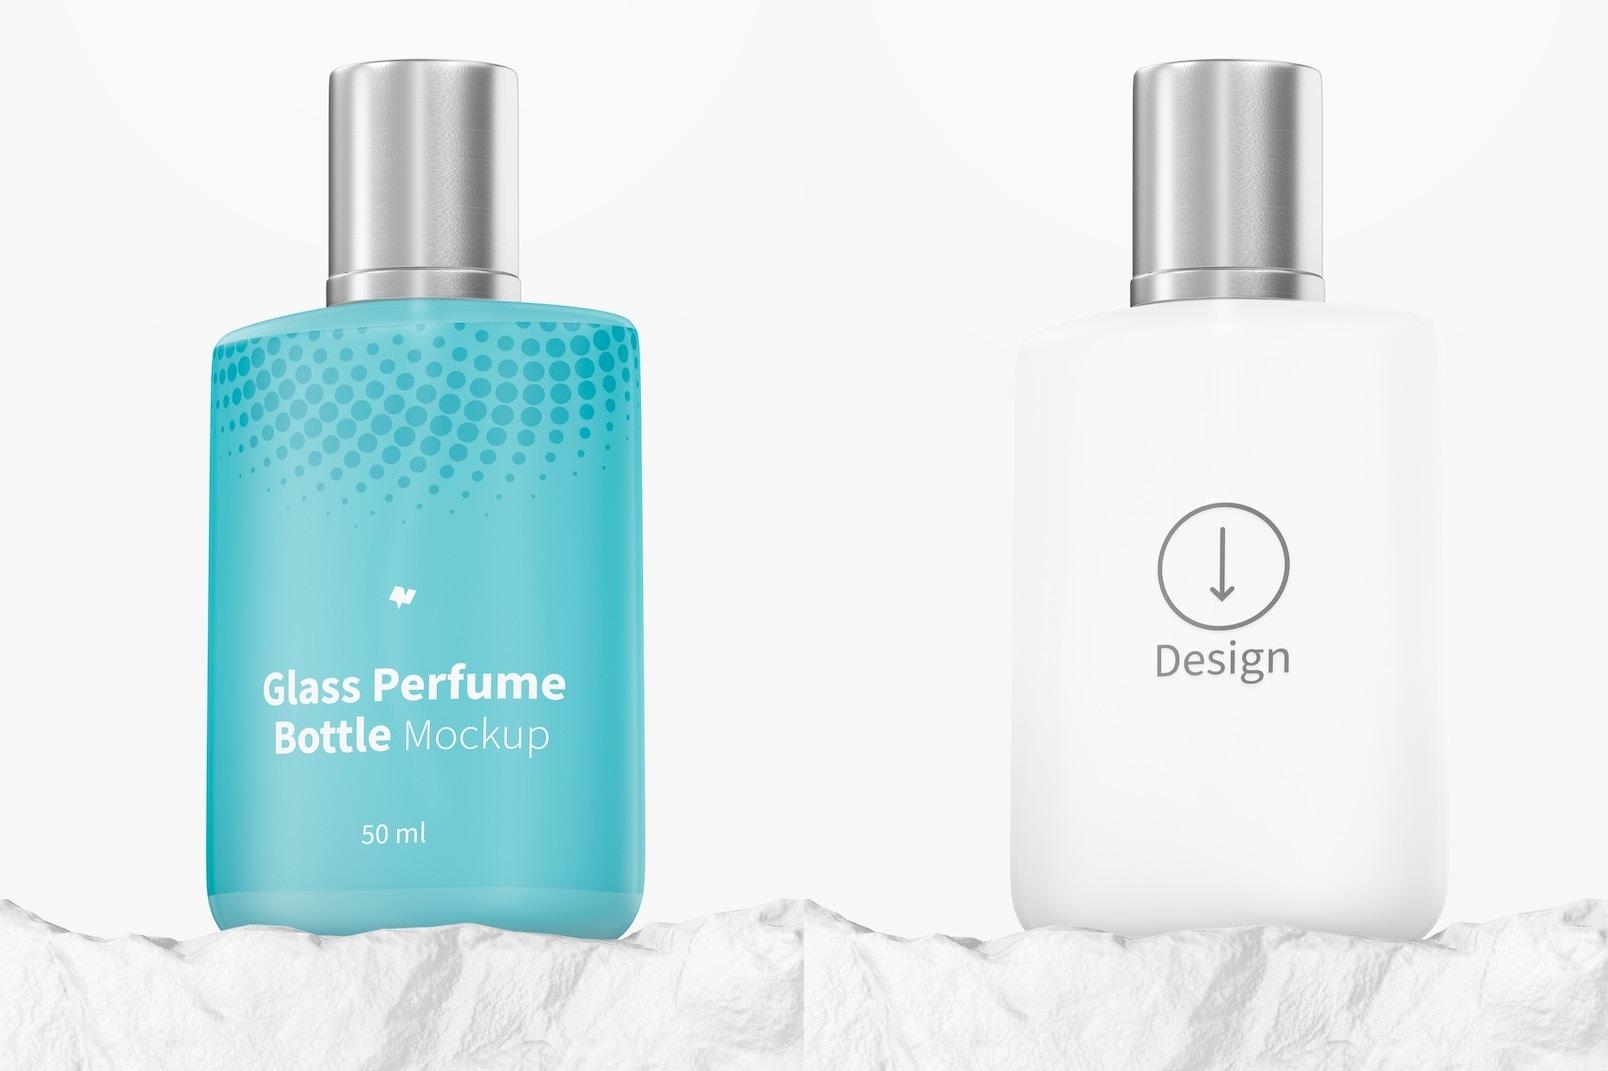 50 ml Glass Perfume Bottle Mockup